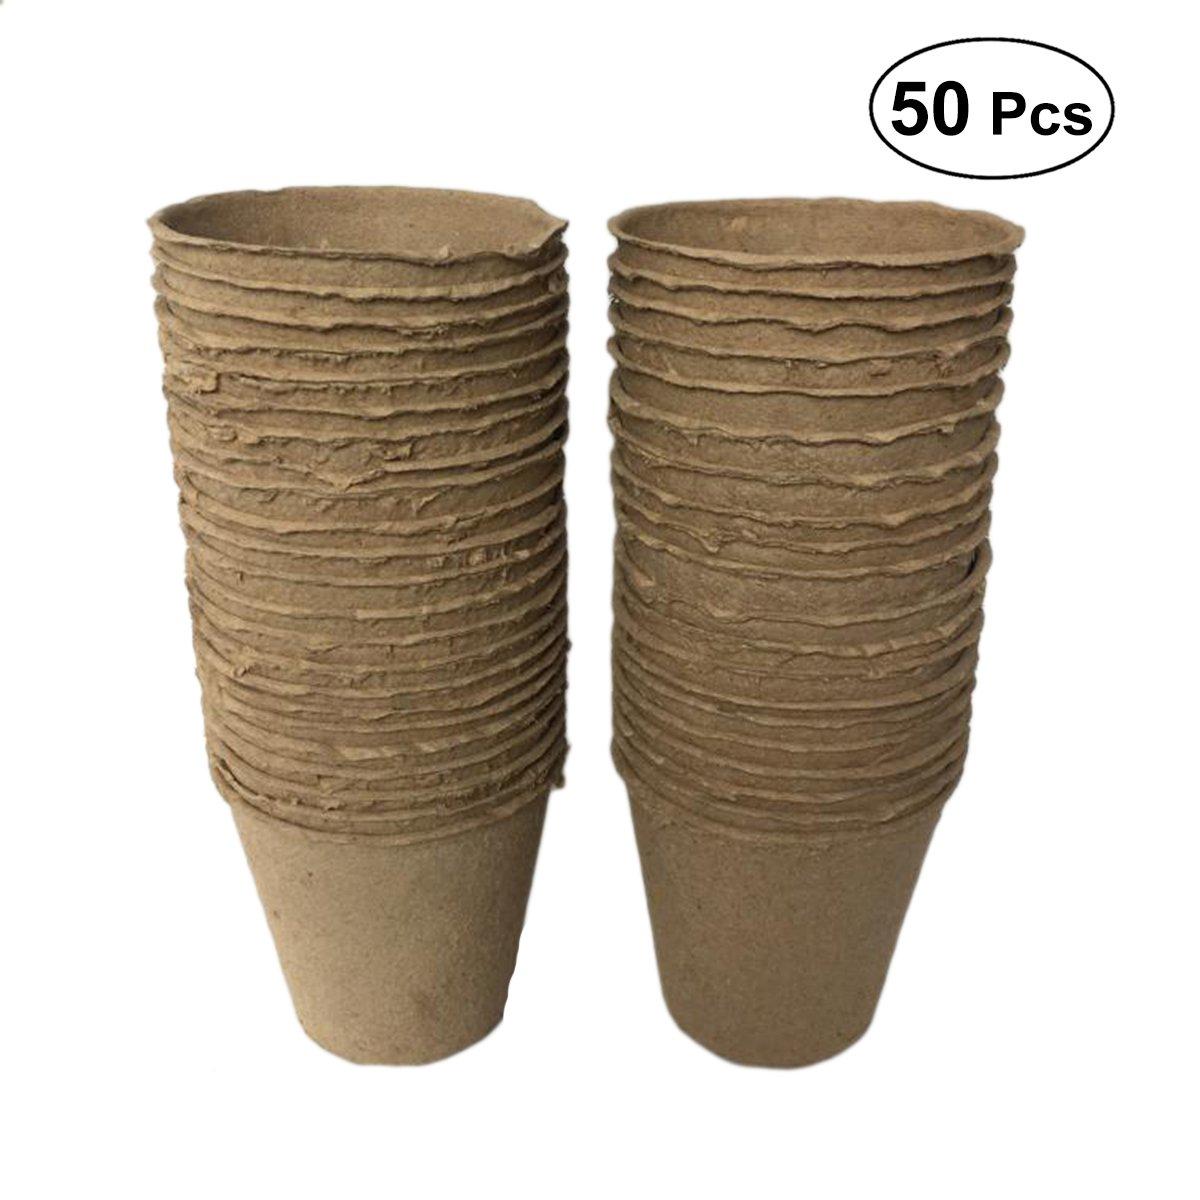 OUNONA 50PCS Paper Pulp nursery pot Seedling nursery pots Cup biodegradabile forniture da giardino